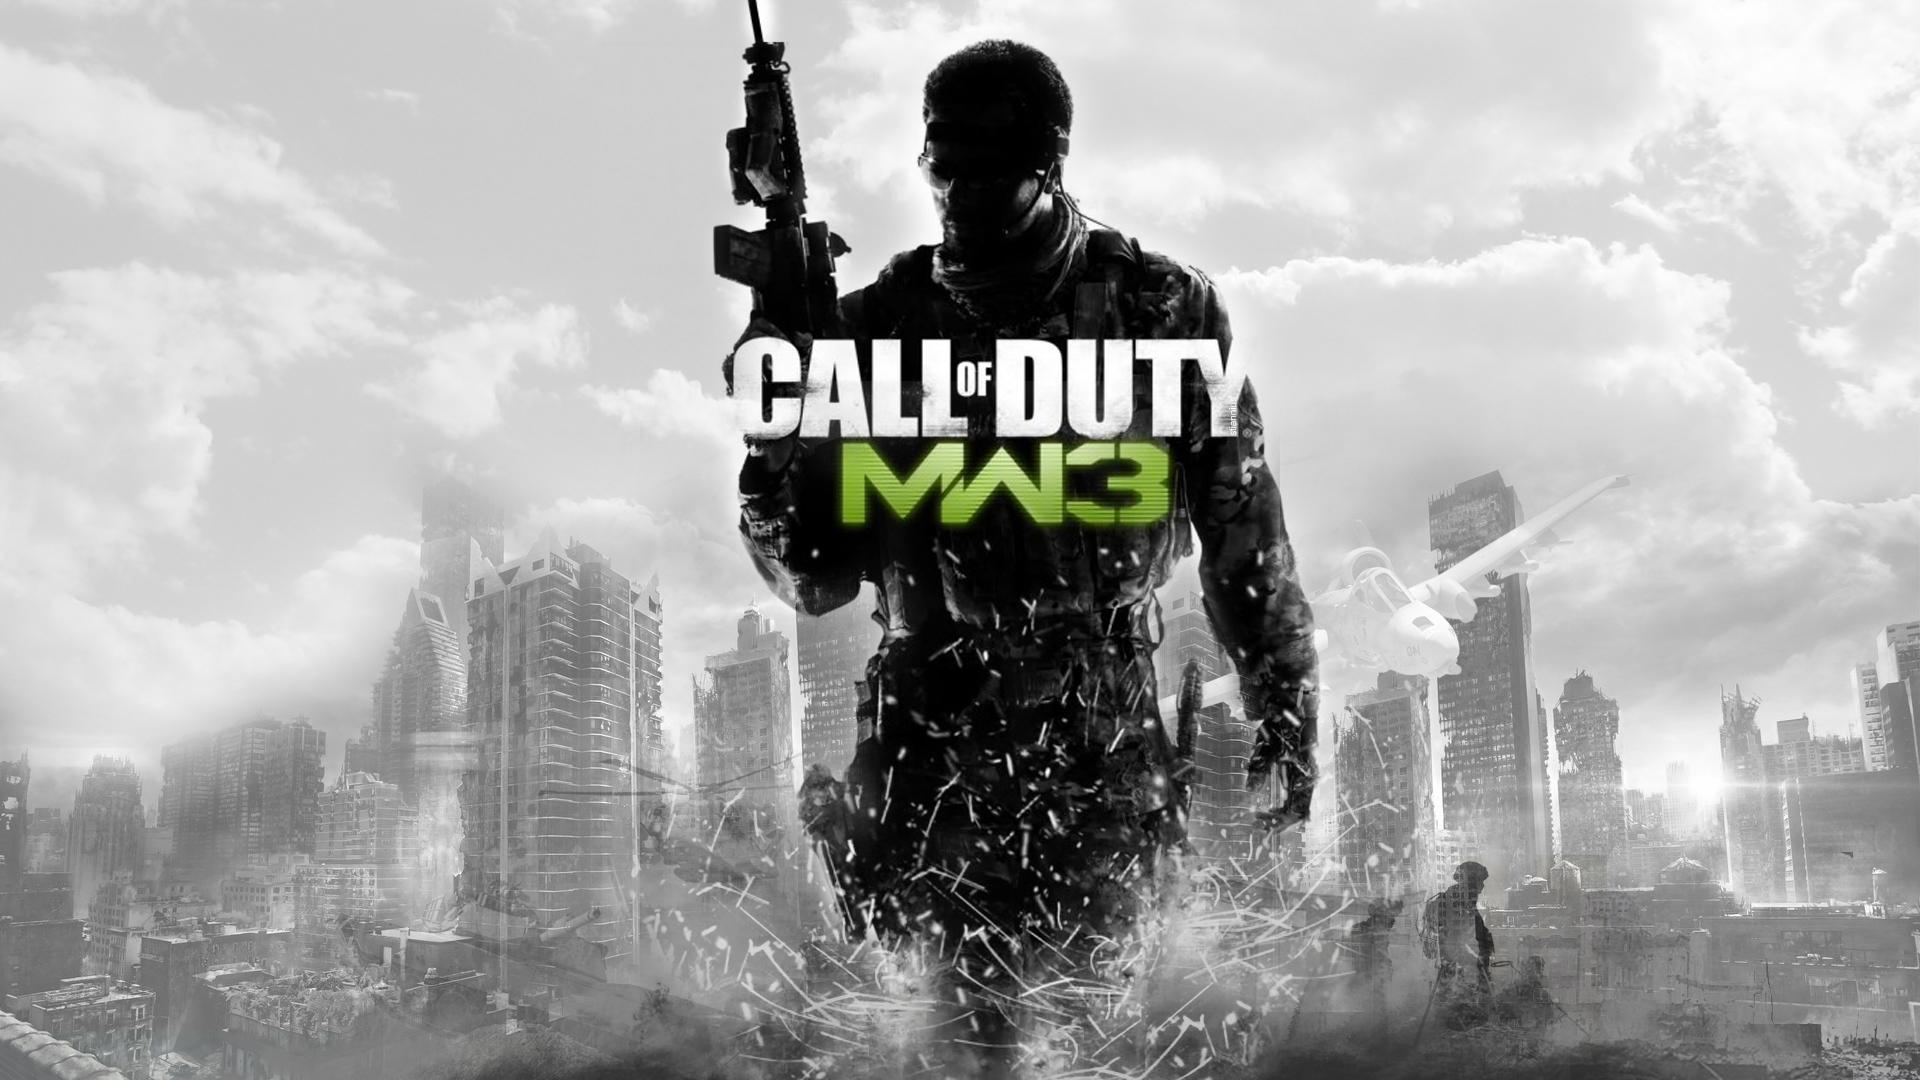 Top 5 Worst Ways to Die in Call of Duty: Modern Warfare 3